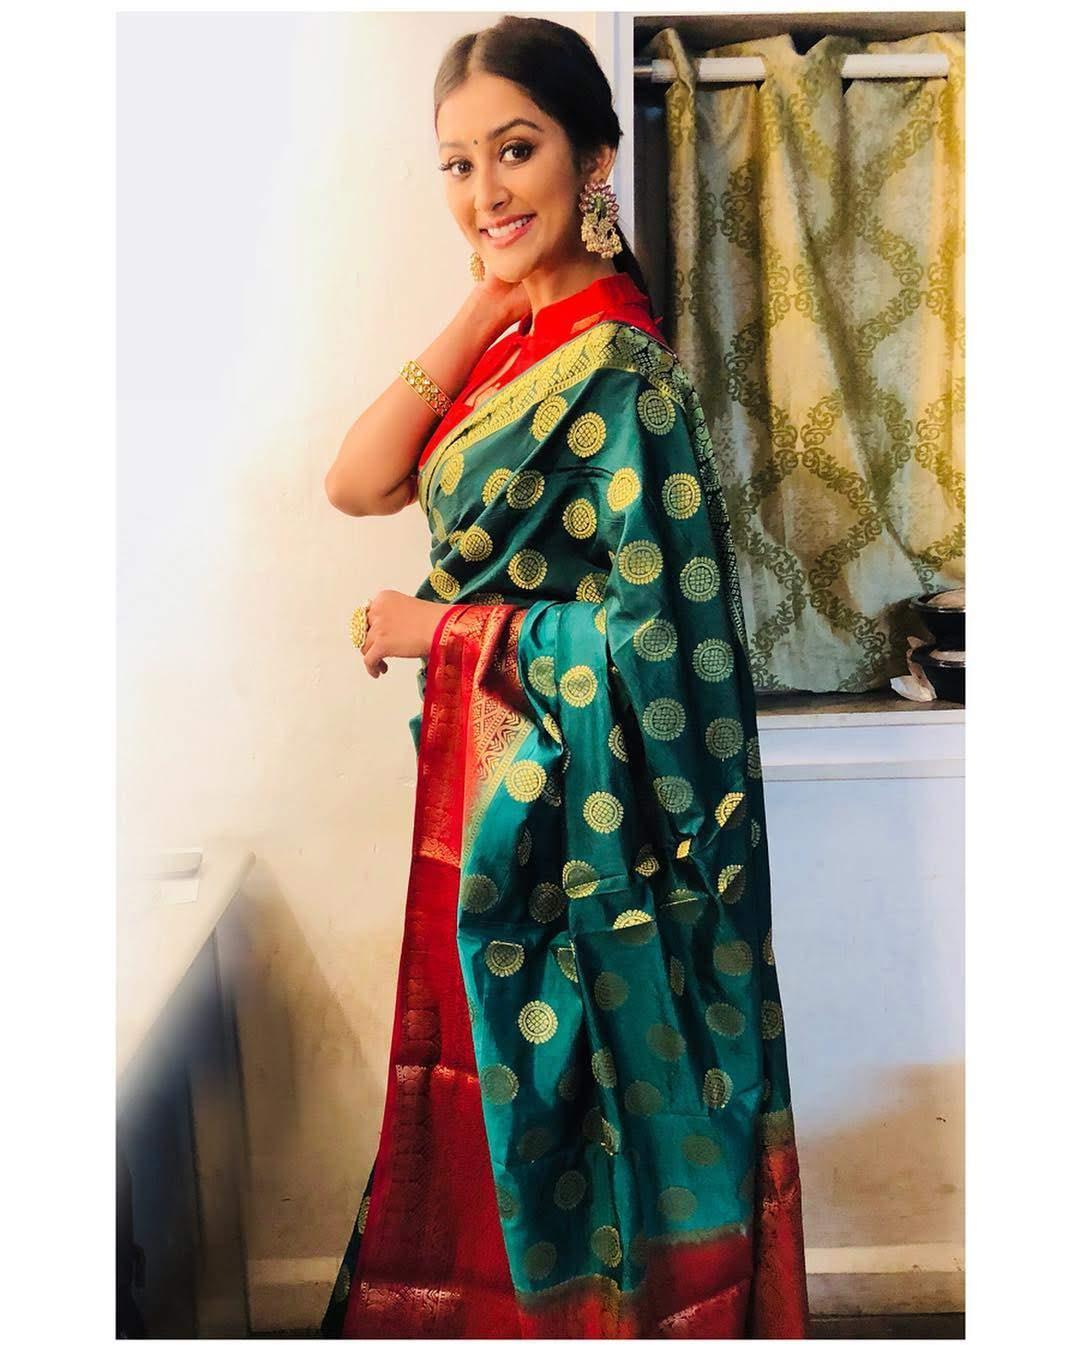 Pooja-Jhaveri-611720